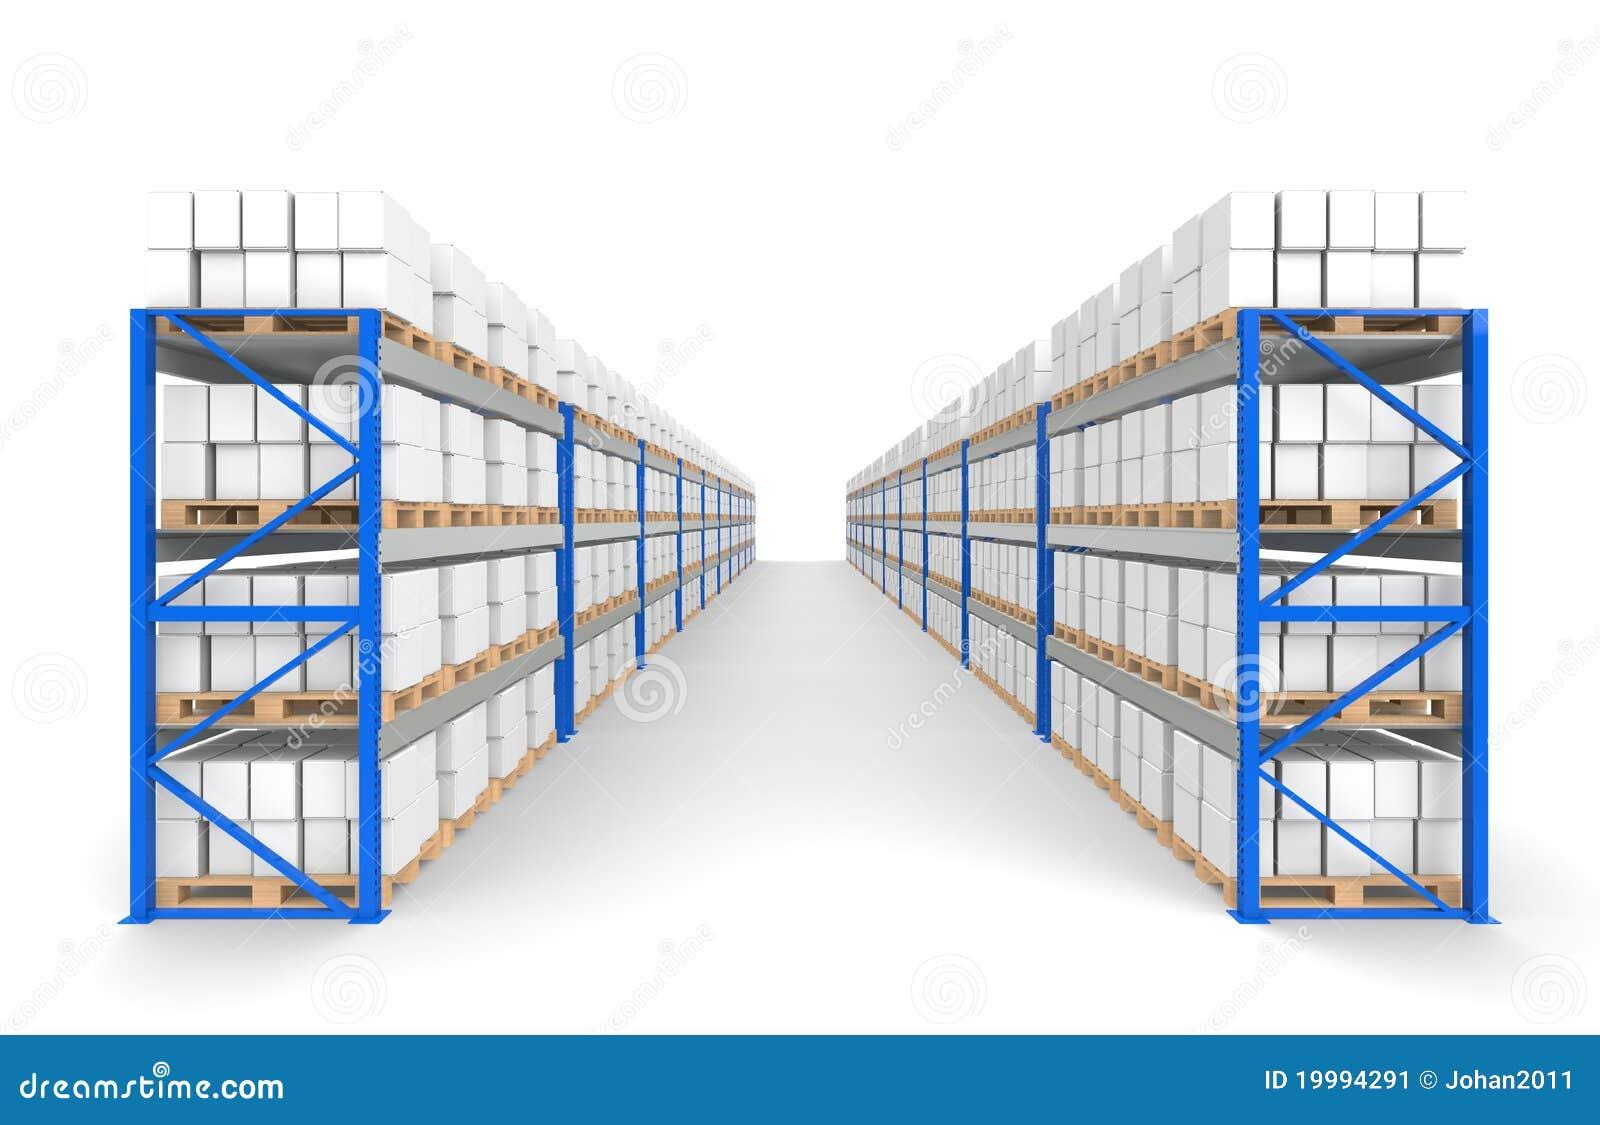 Warehouse Shelves 2 Rows Floor Shadows Stock Image